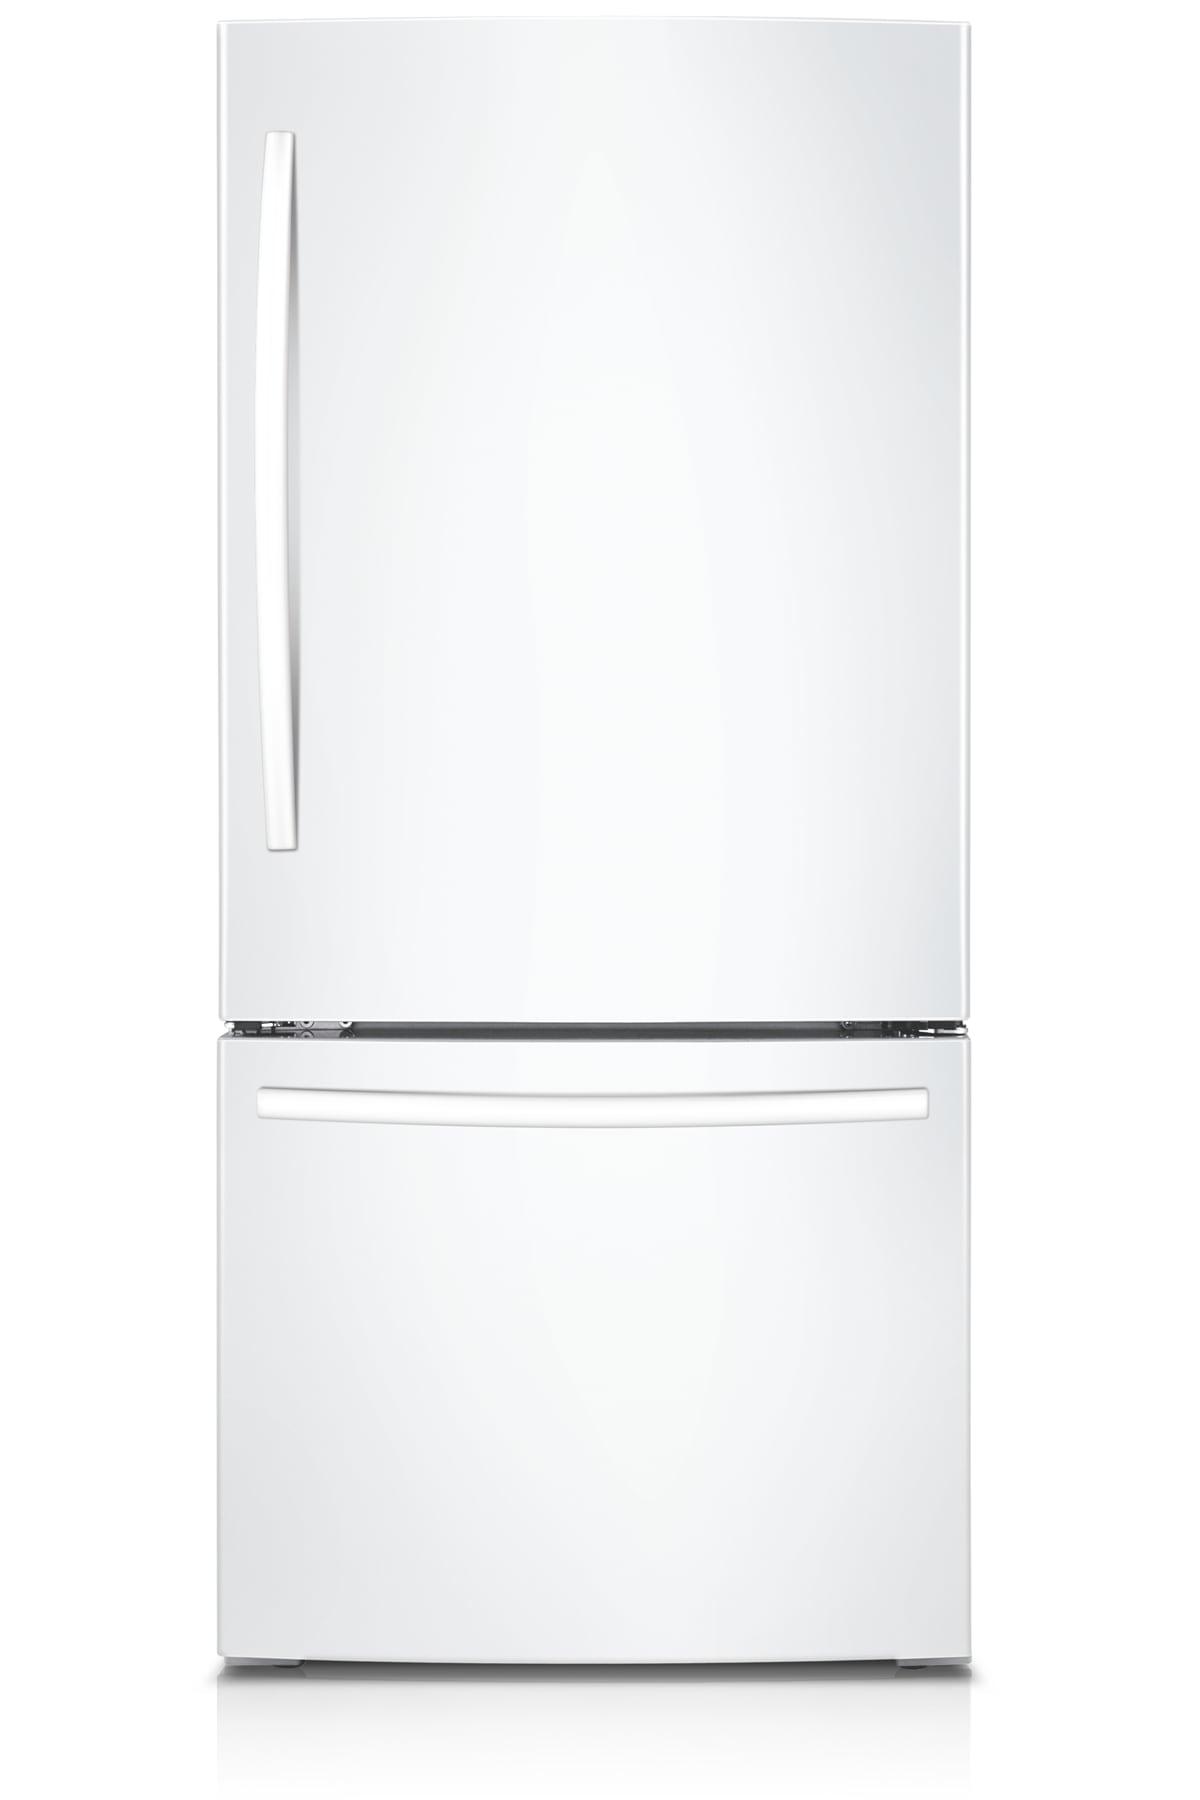 IBACI-BMF 21.6 cu.ft Bottom Mount Freezer Refrigerator (White)